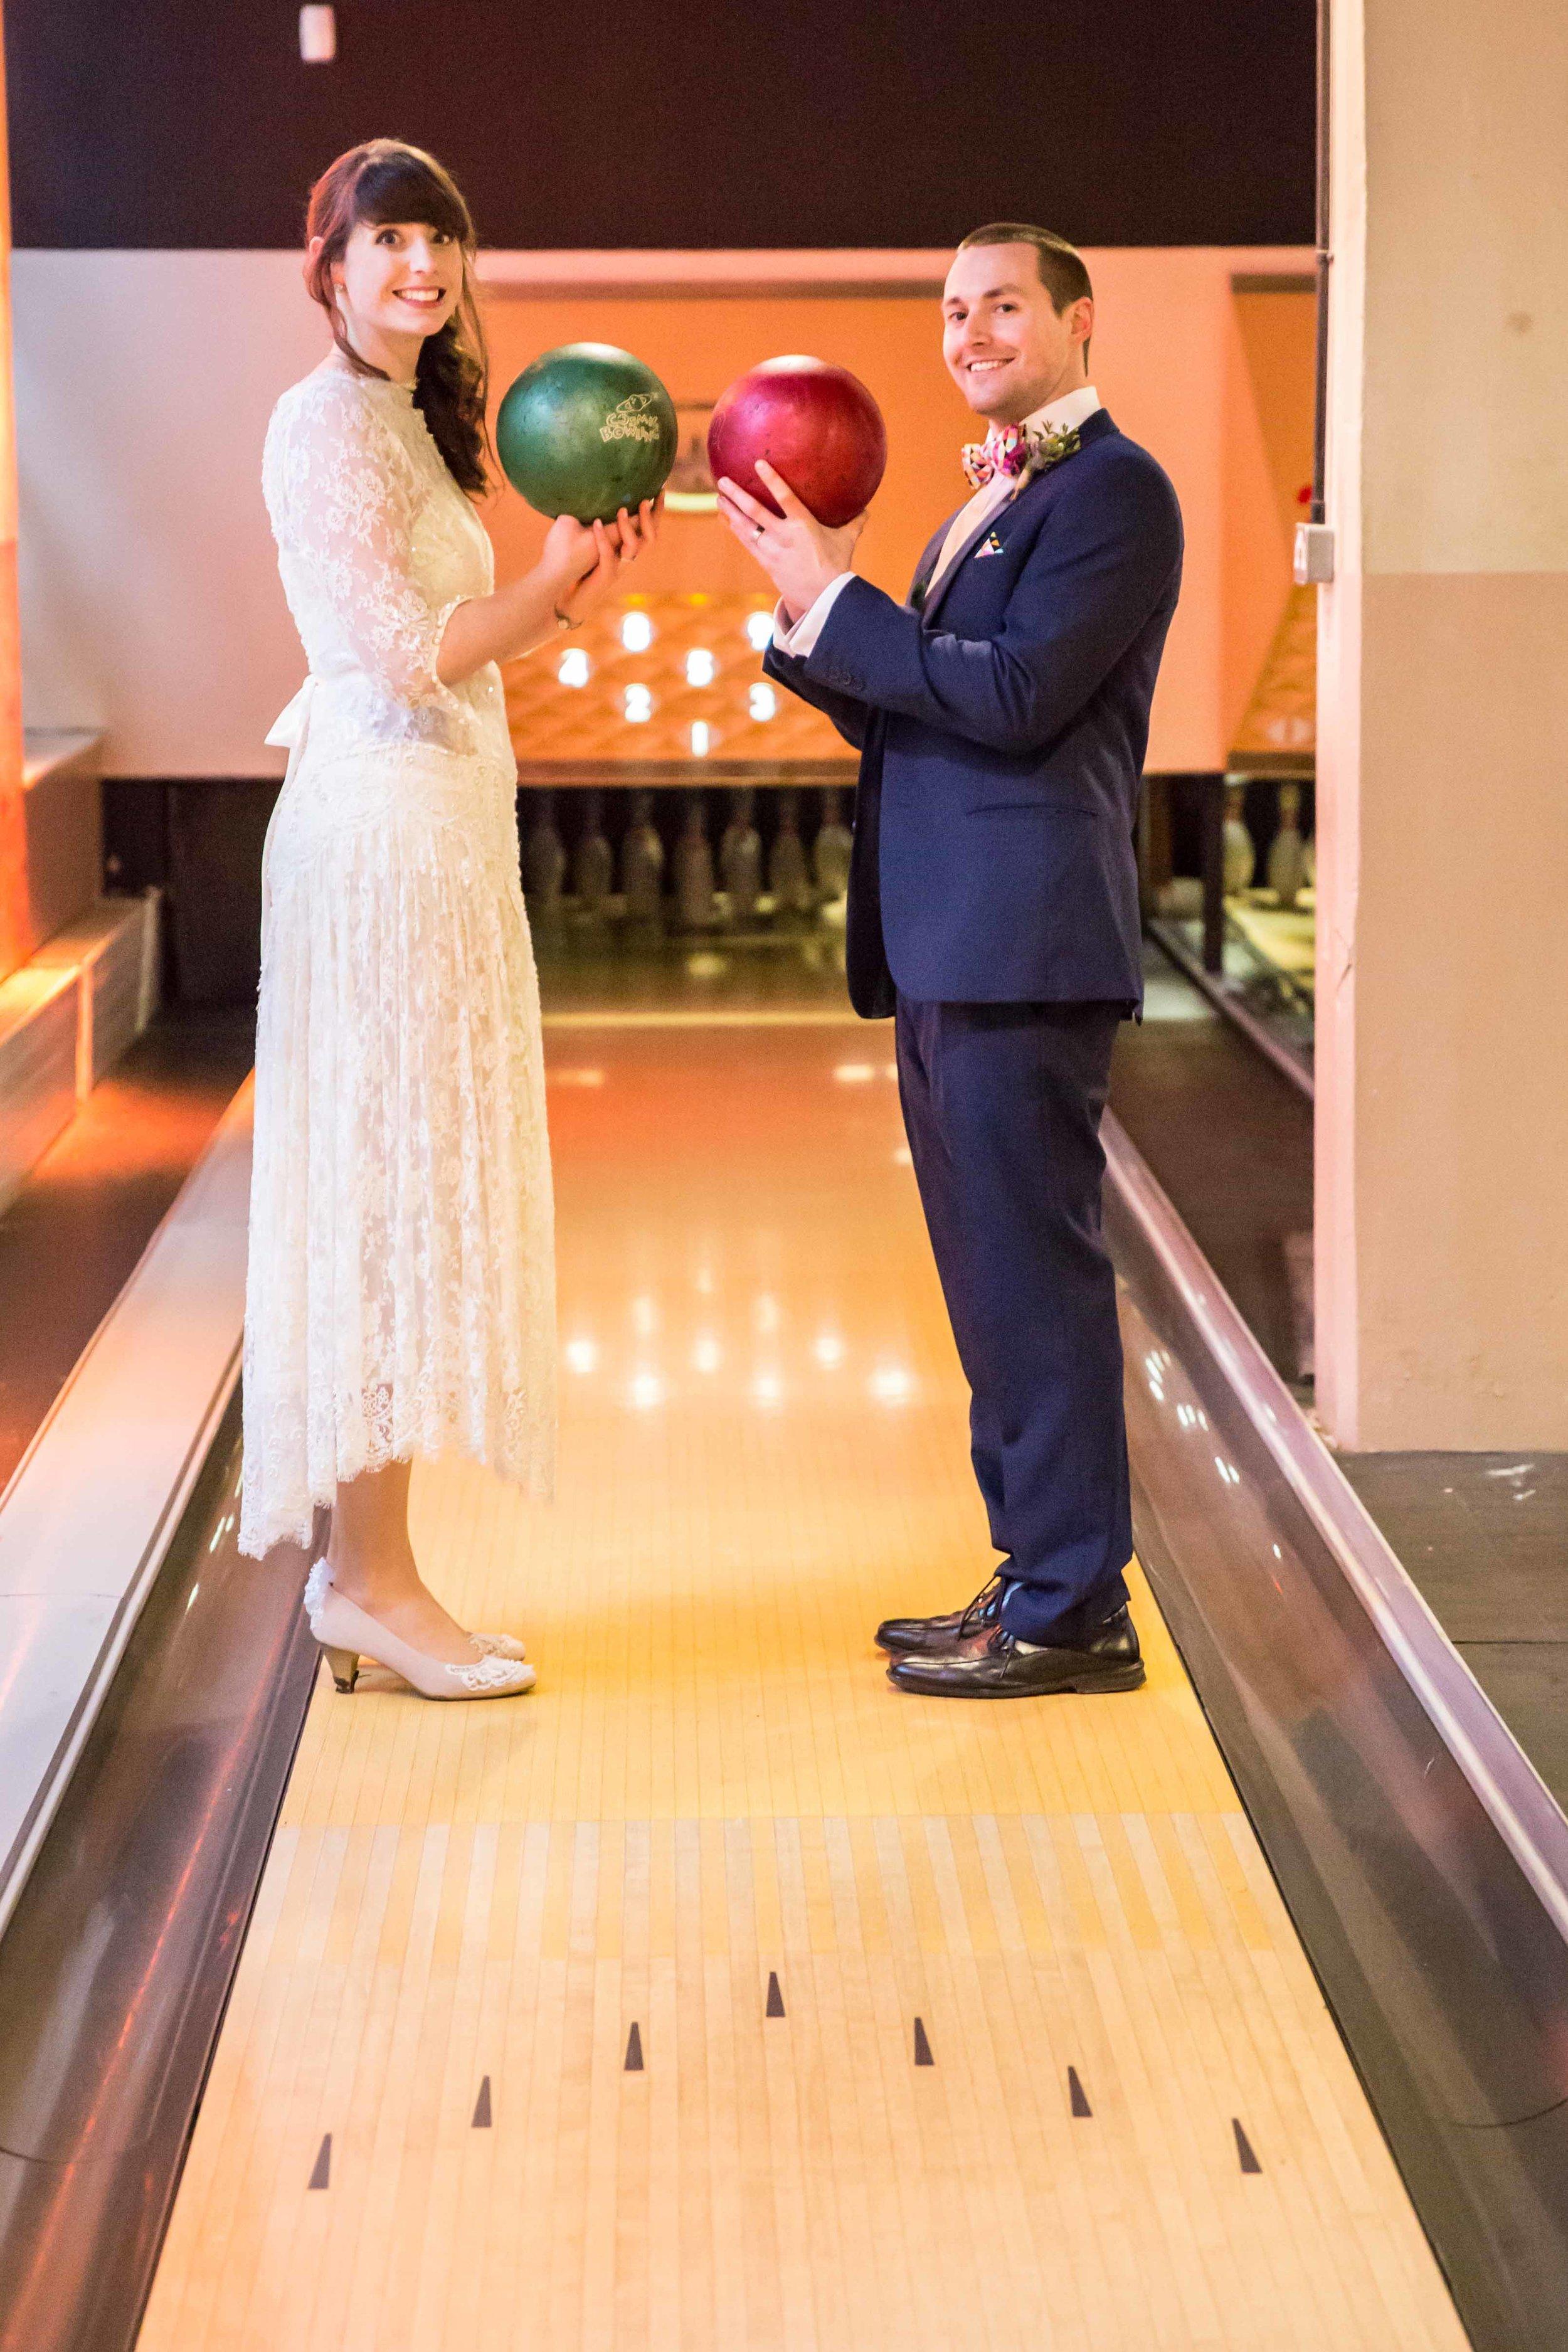 Adam & Faye - Wright Wedding Photography - Bristol Wedding Photographer -315.jpg